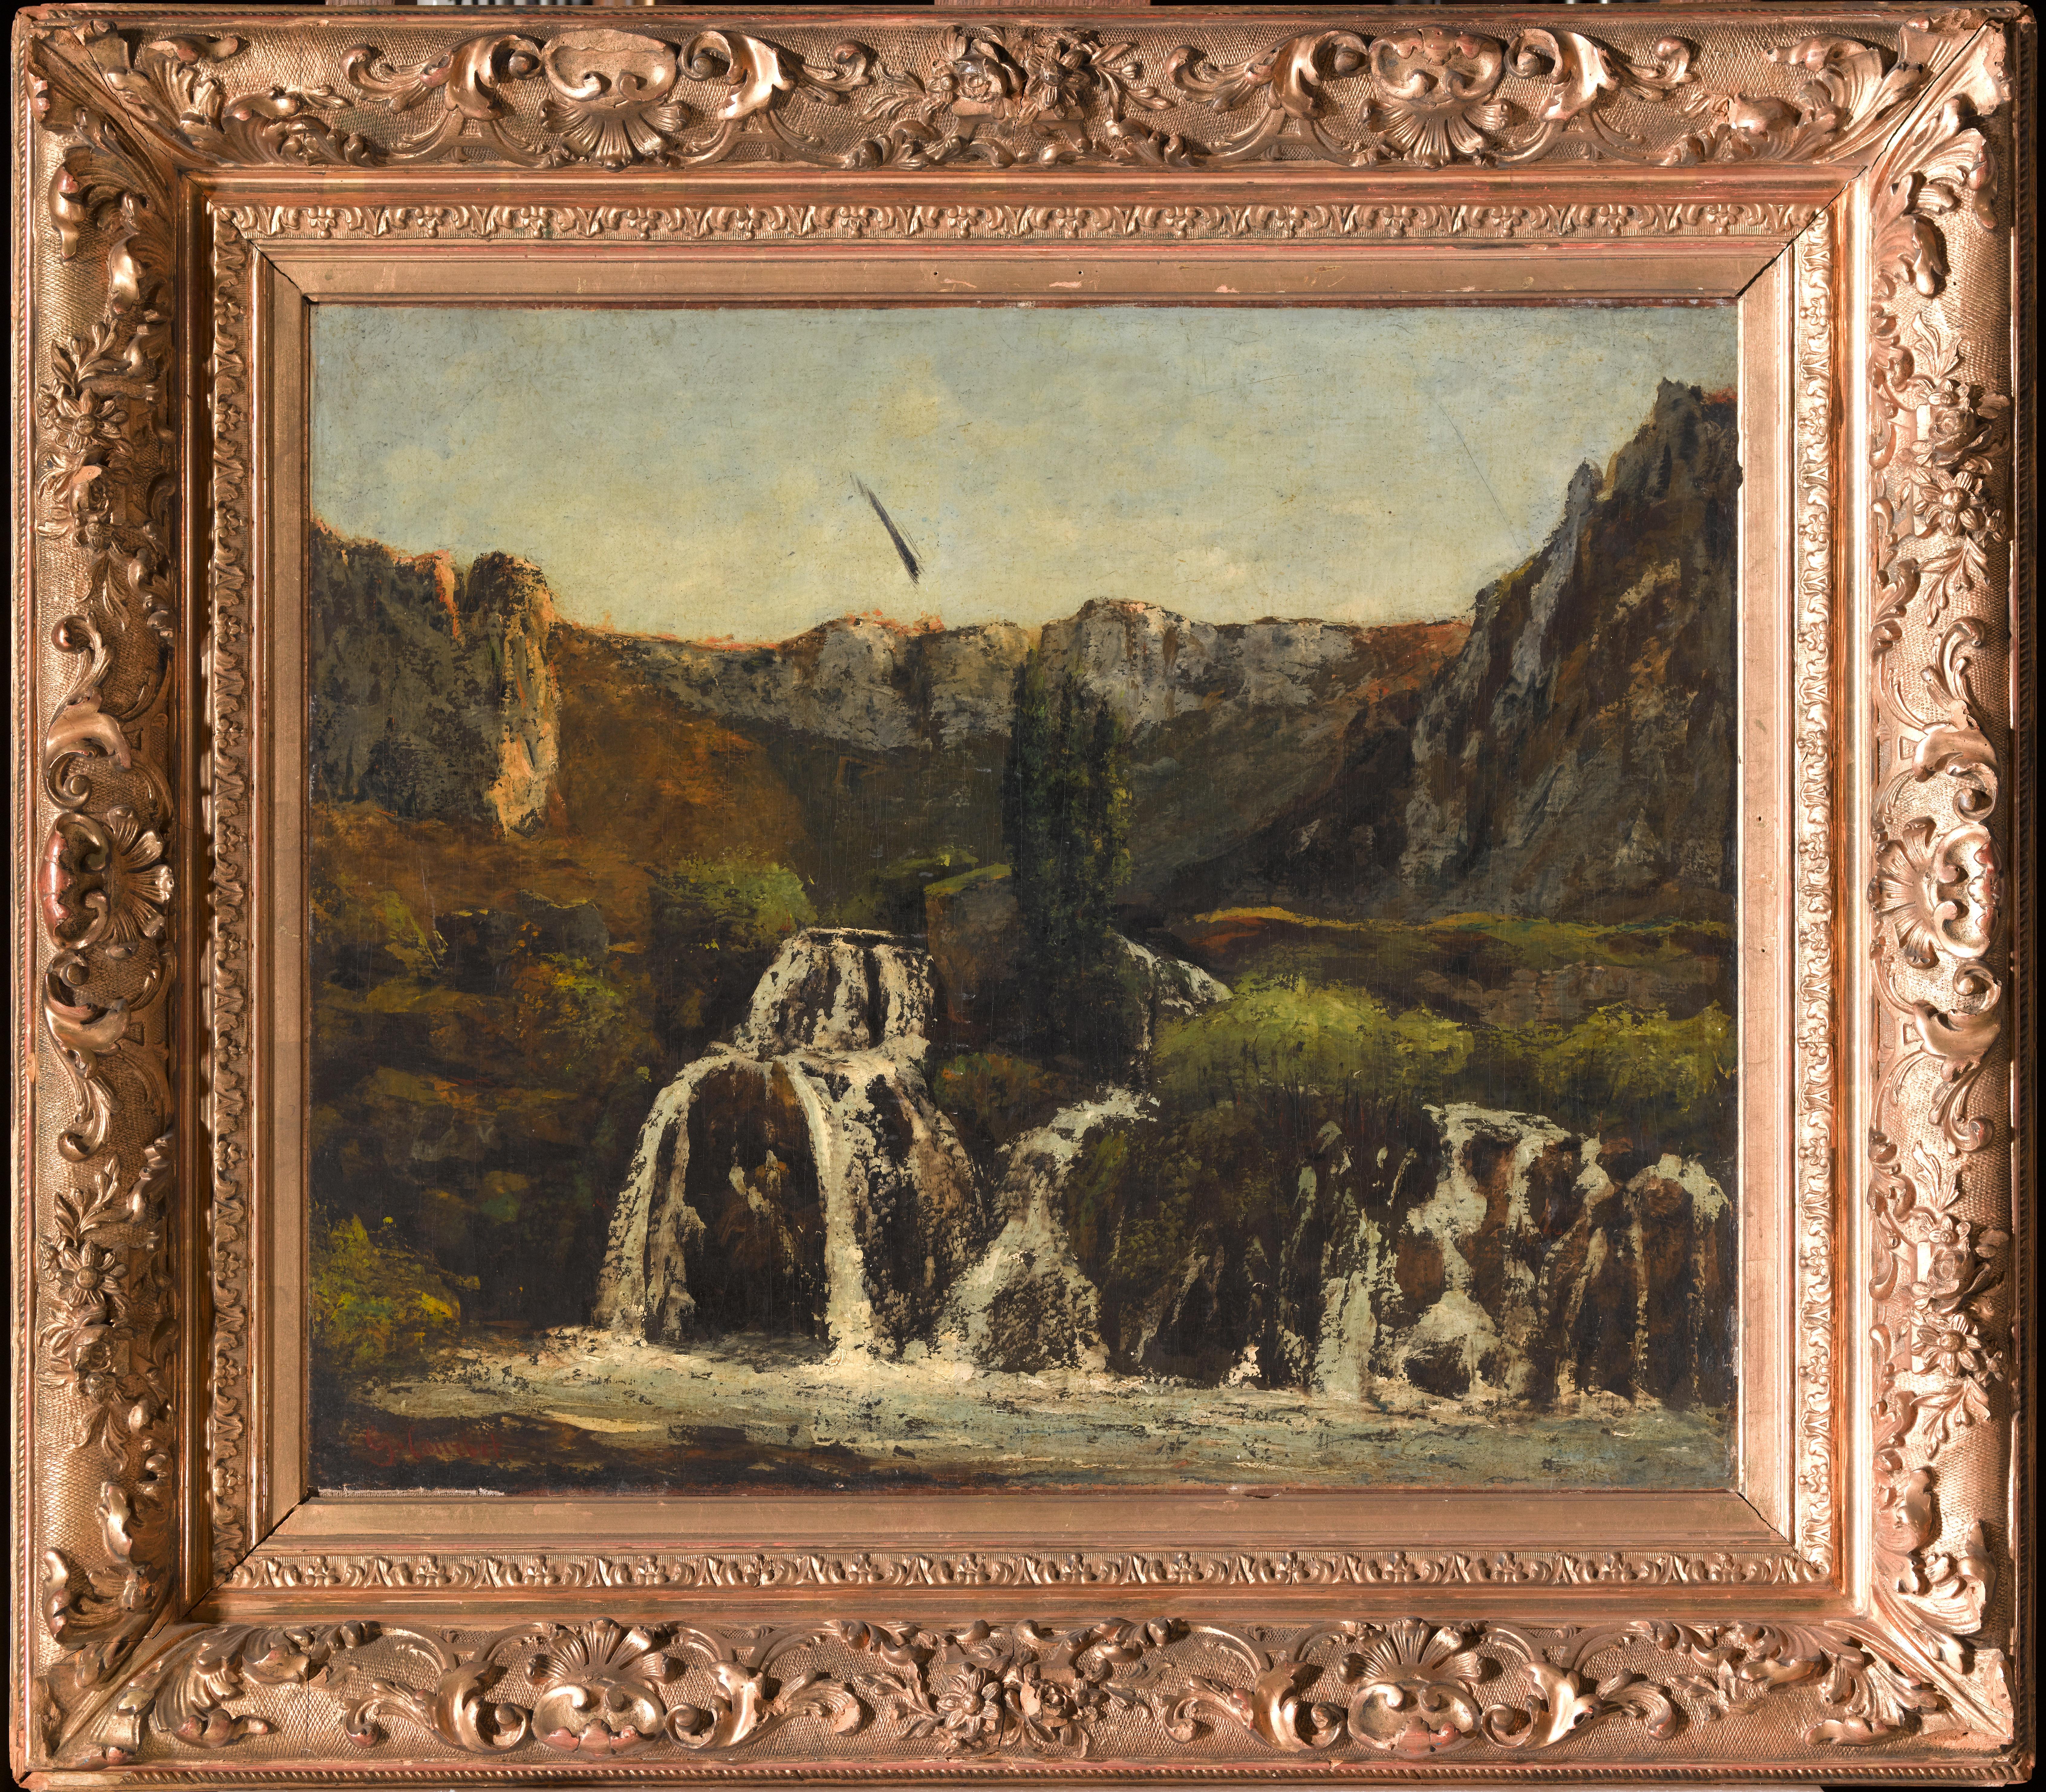 mnr/MNR00644/MNR644-copyright_Musee_d_Orsay_distribution_RMN-Grand_Palais_Patrice_Schmidt.jpg